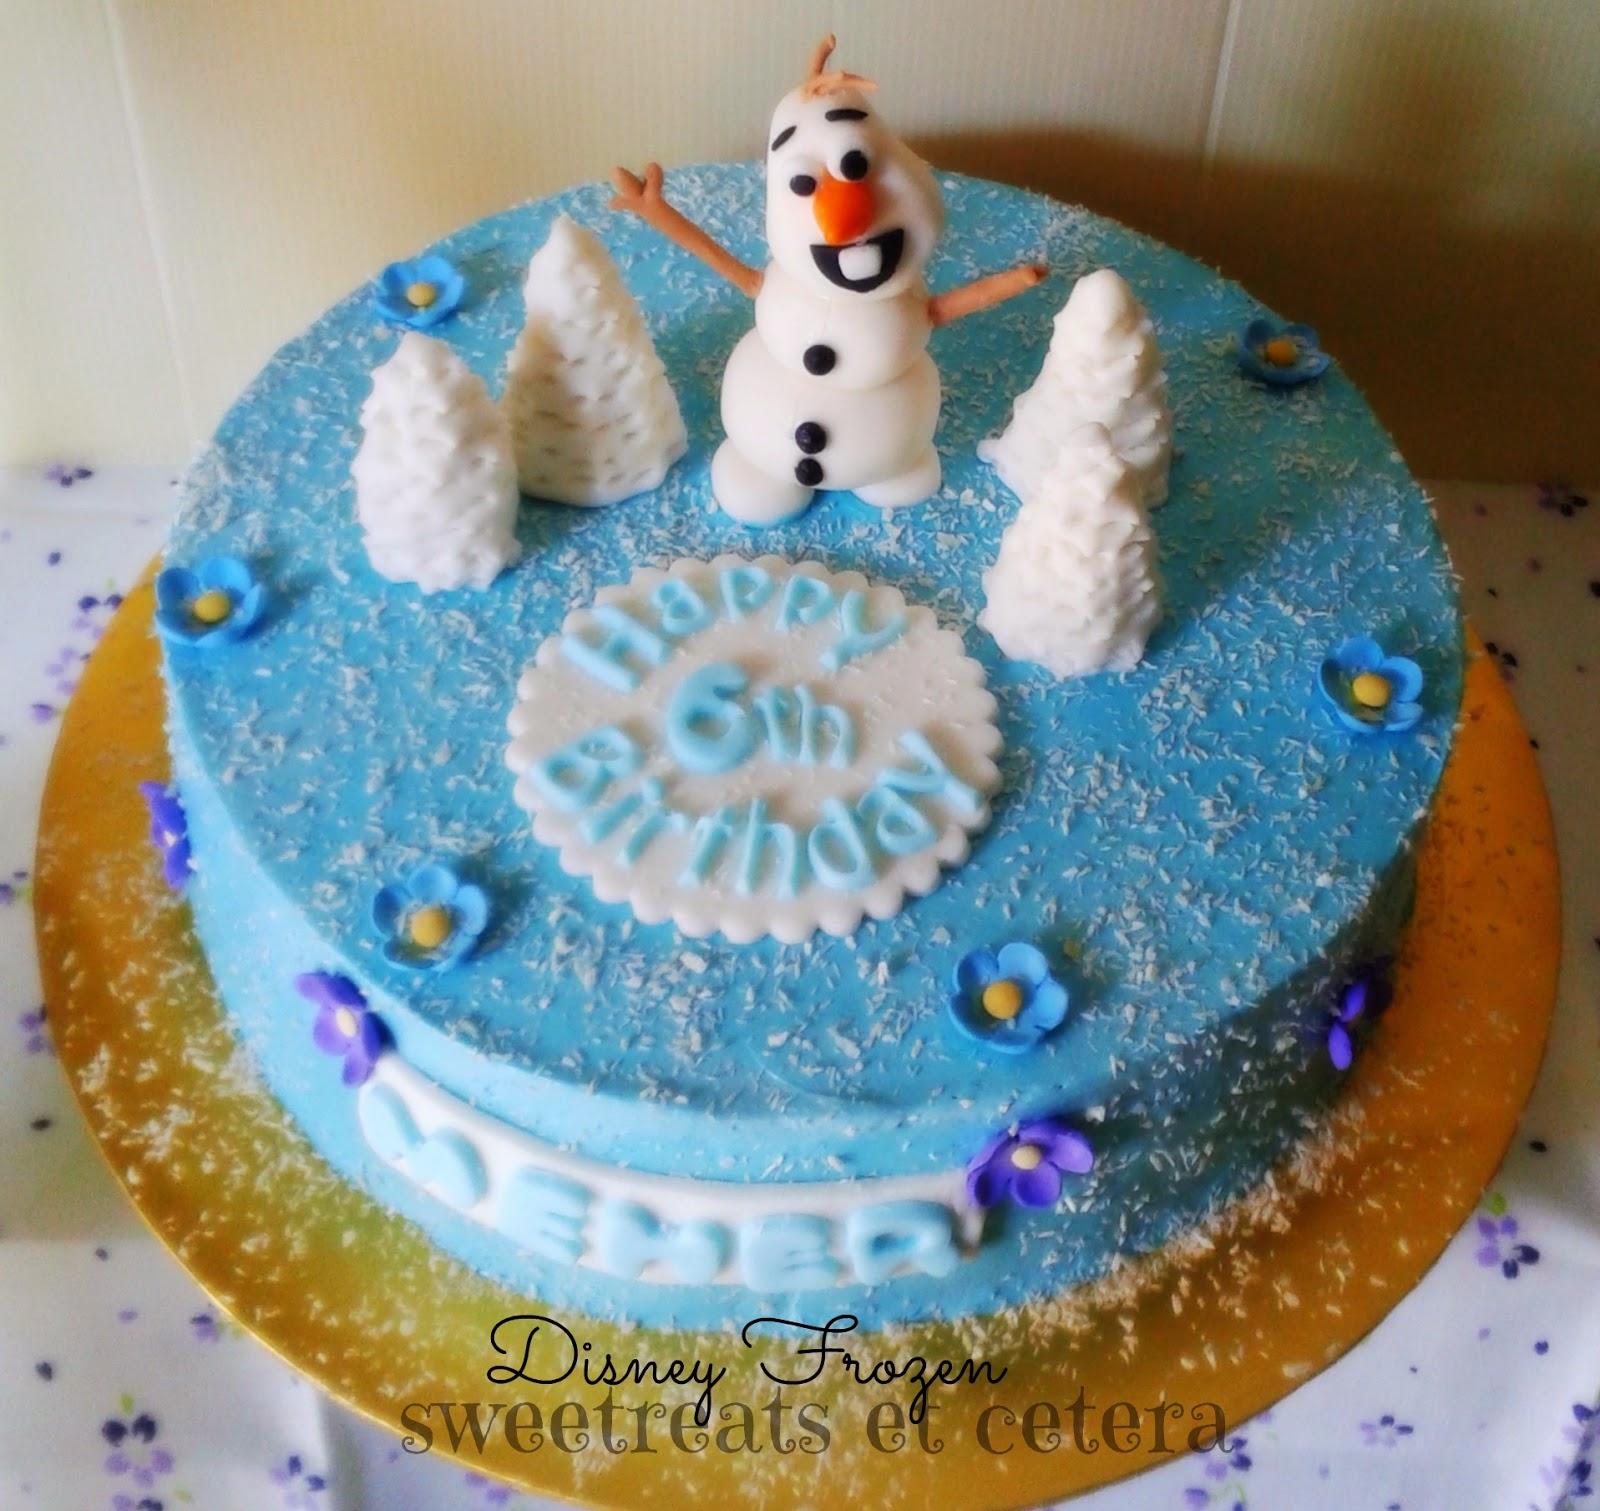 Sweetreats Etcetera: Frozen Theme Cake